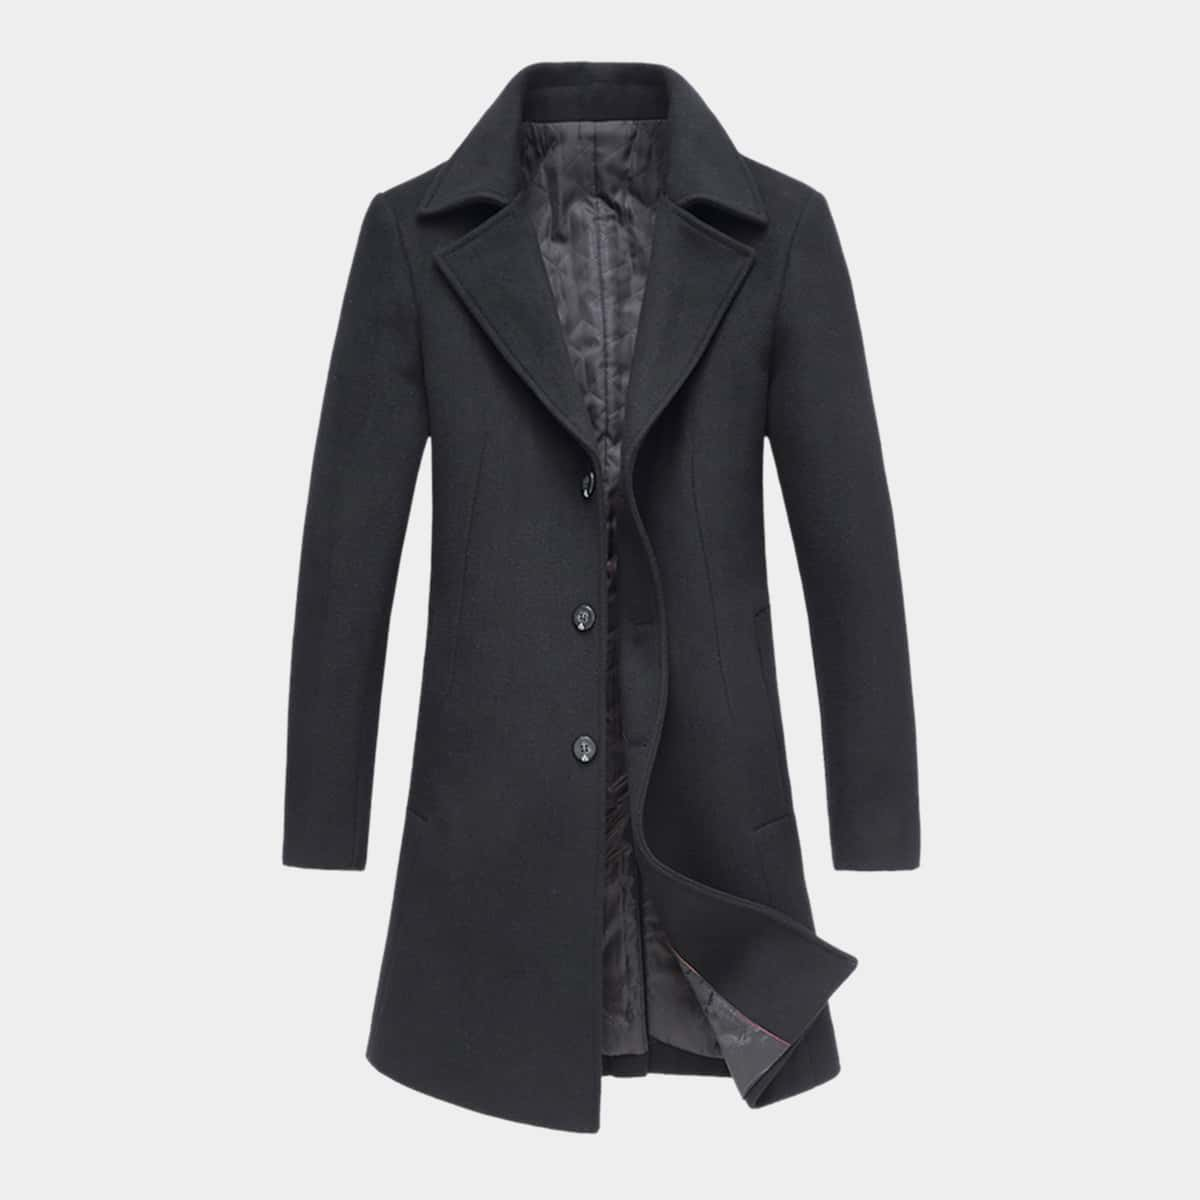 Men Lapel Collar Button Front Overcoat